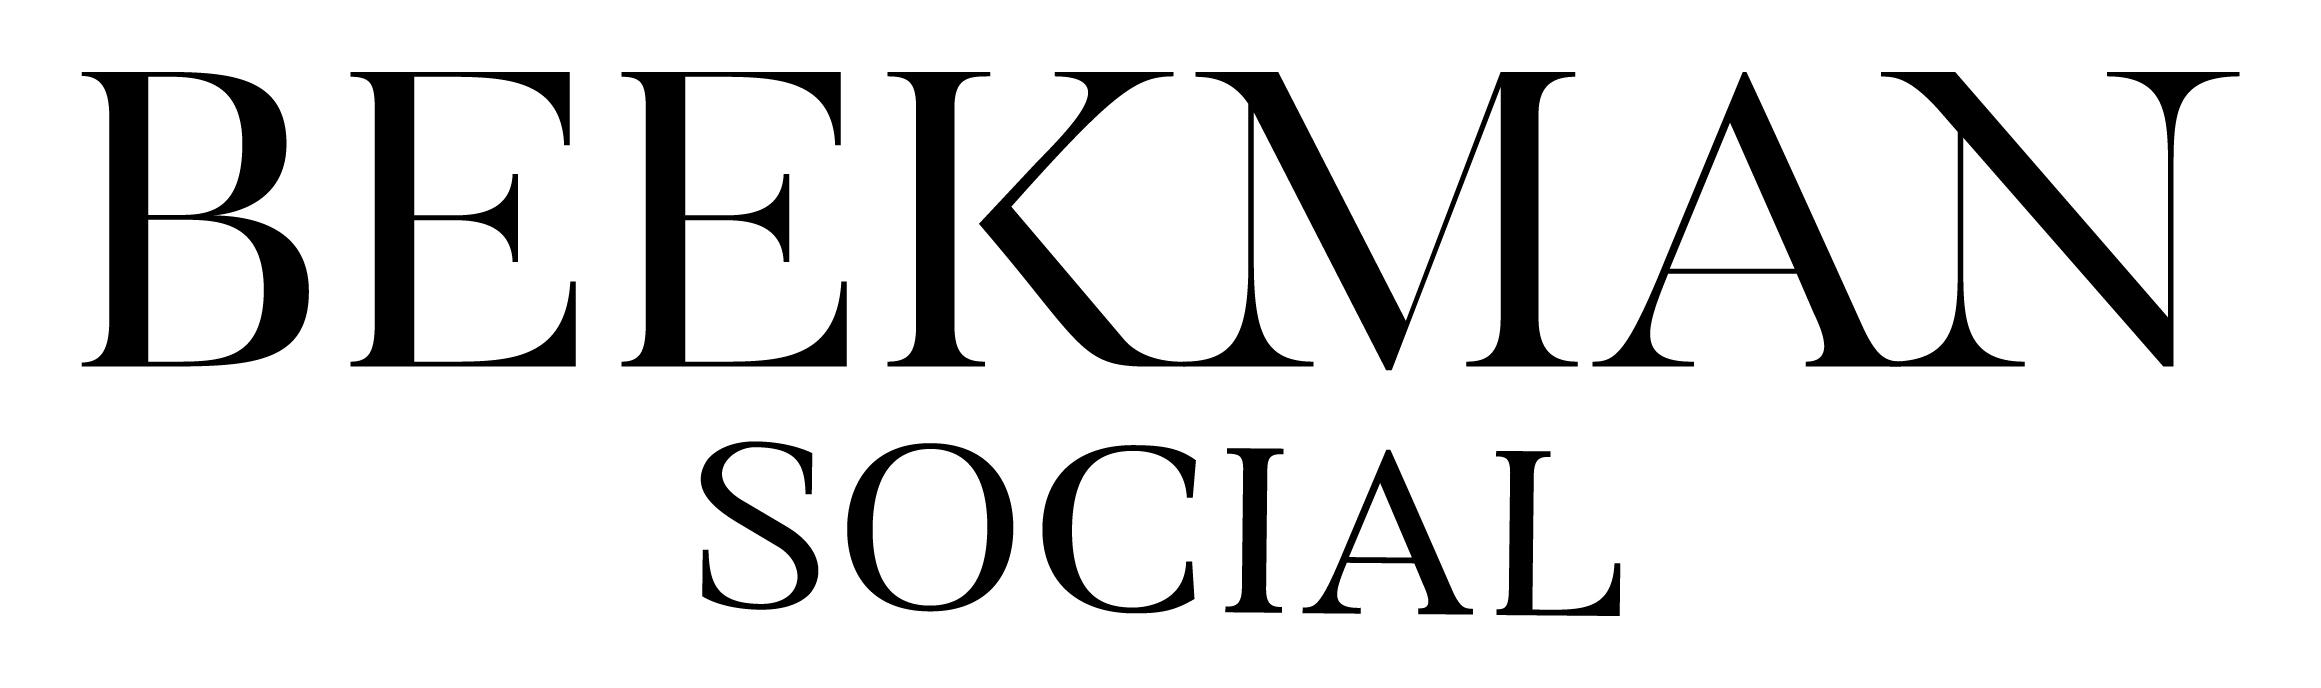 plan_a_partner_beekman_social_logo.jpg